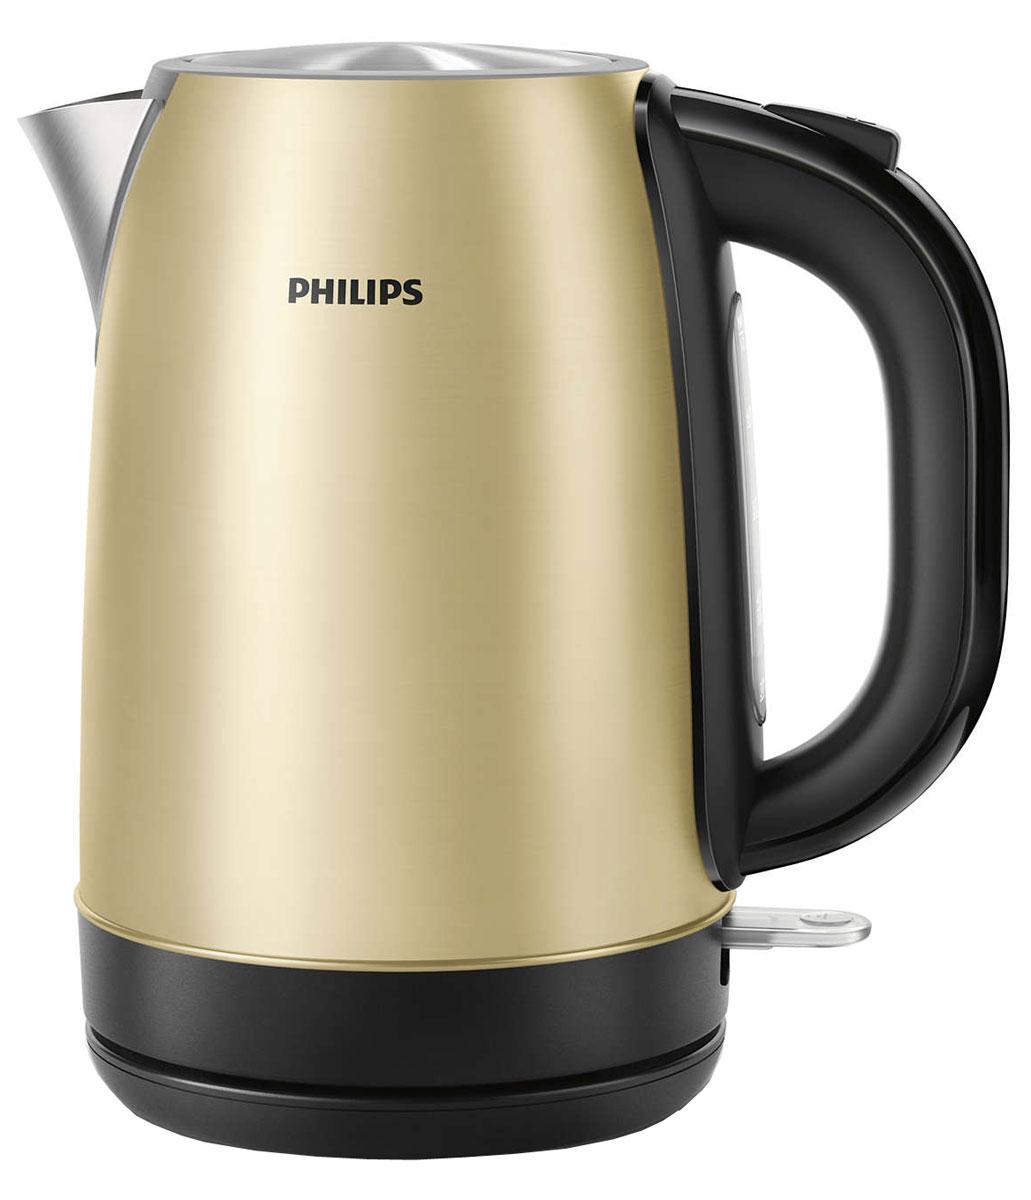 Philips HD 9324/50 электрический чайник